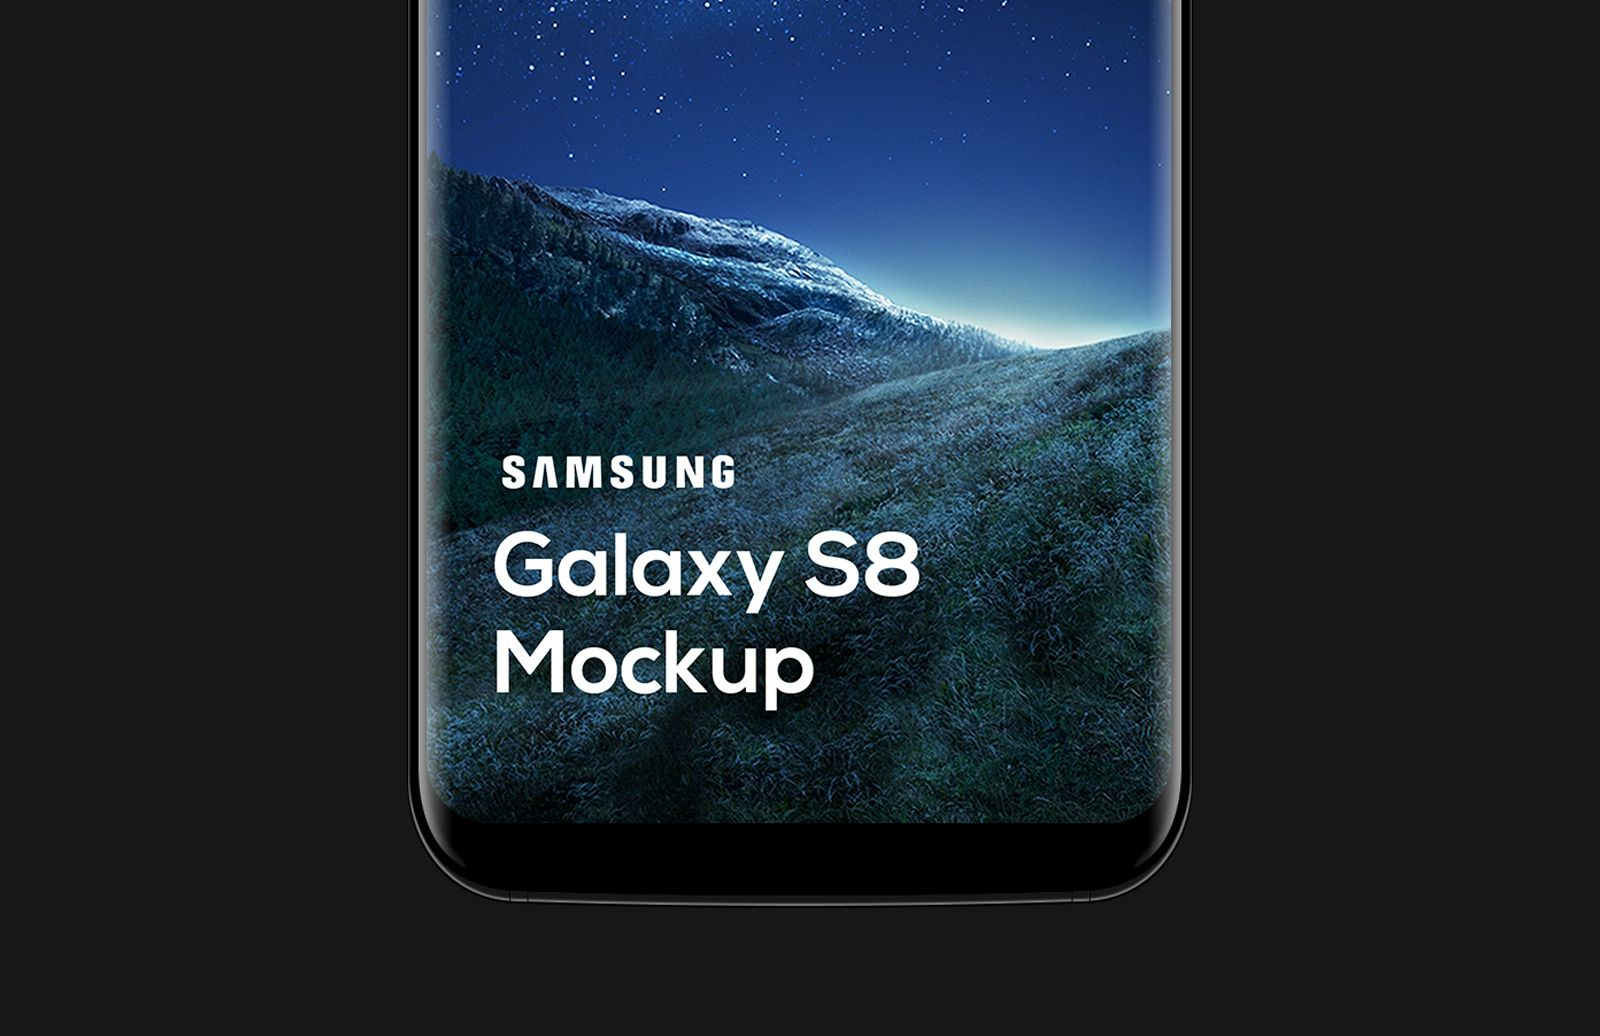 Samsung Galaxy S8 Mockup Preview 1